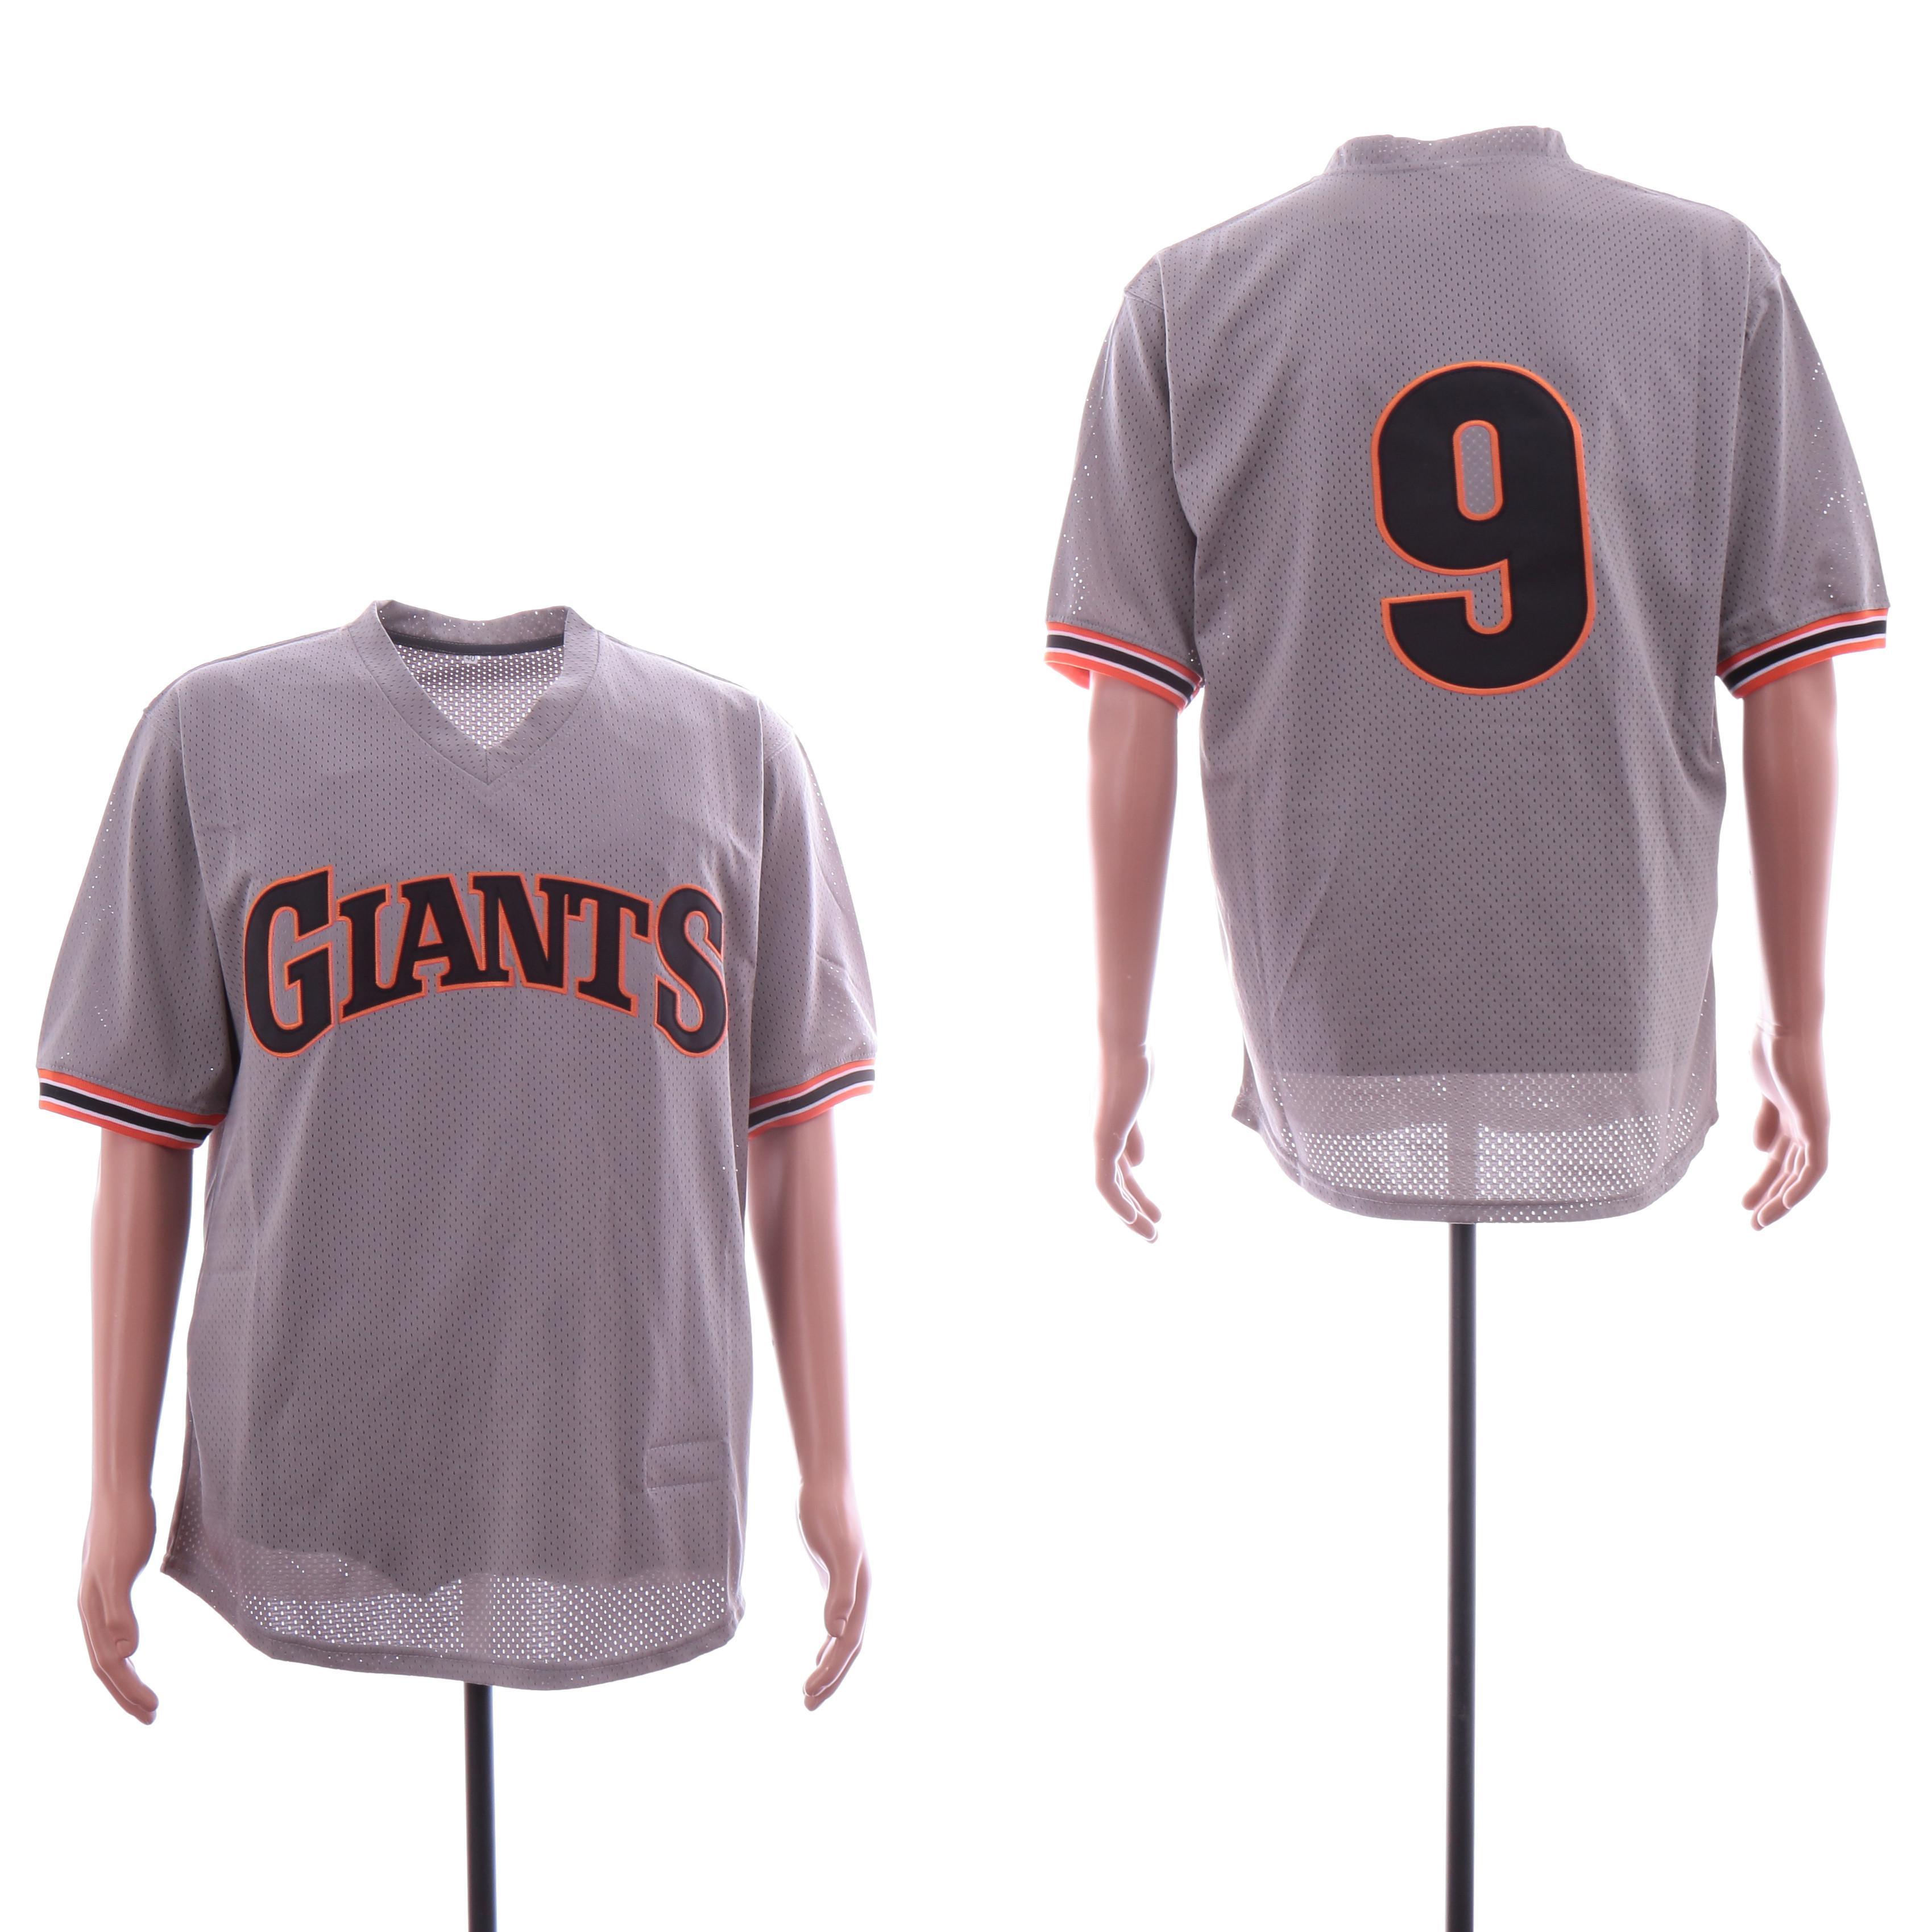 Giants 9 Matt Williams Gray BP Mesh Jersey